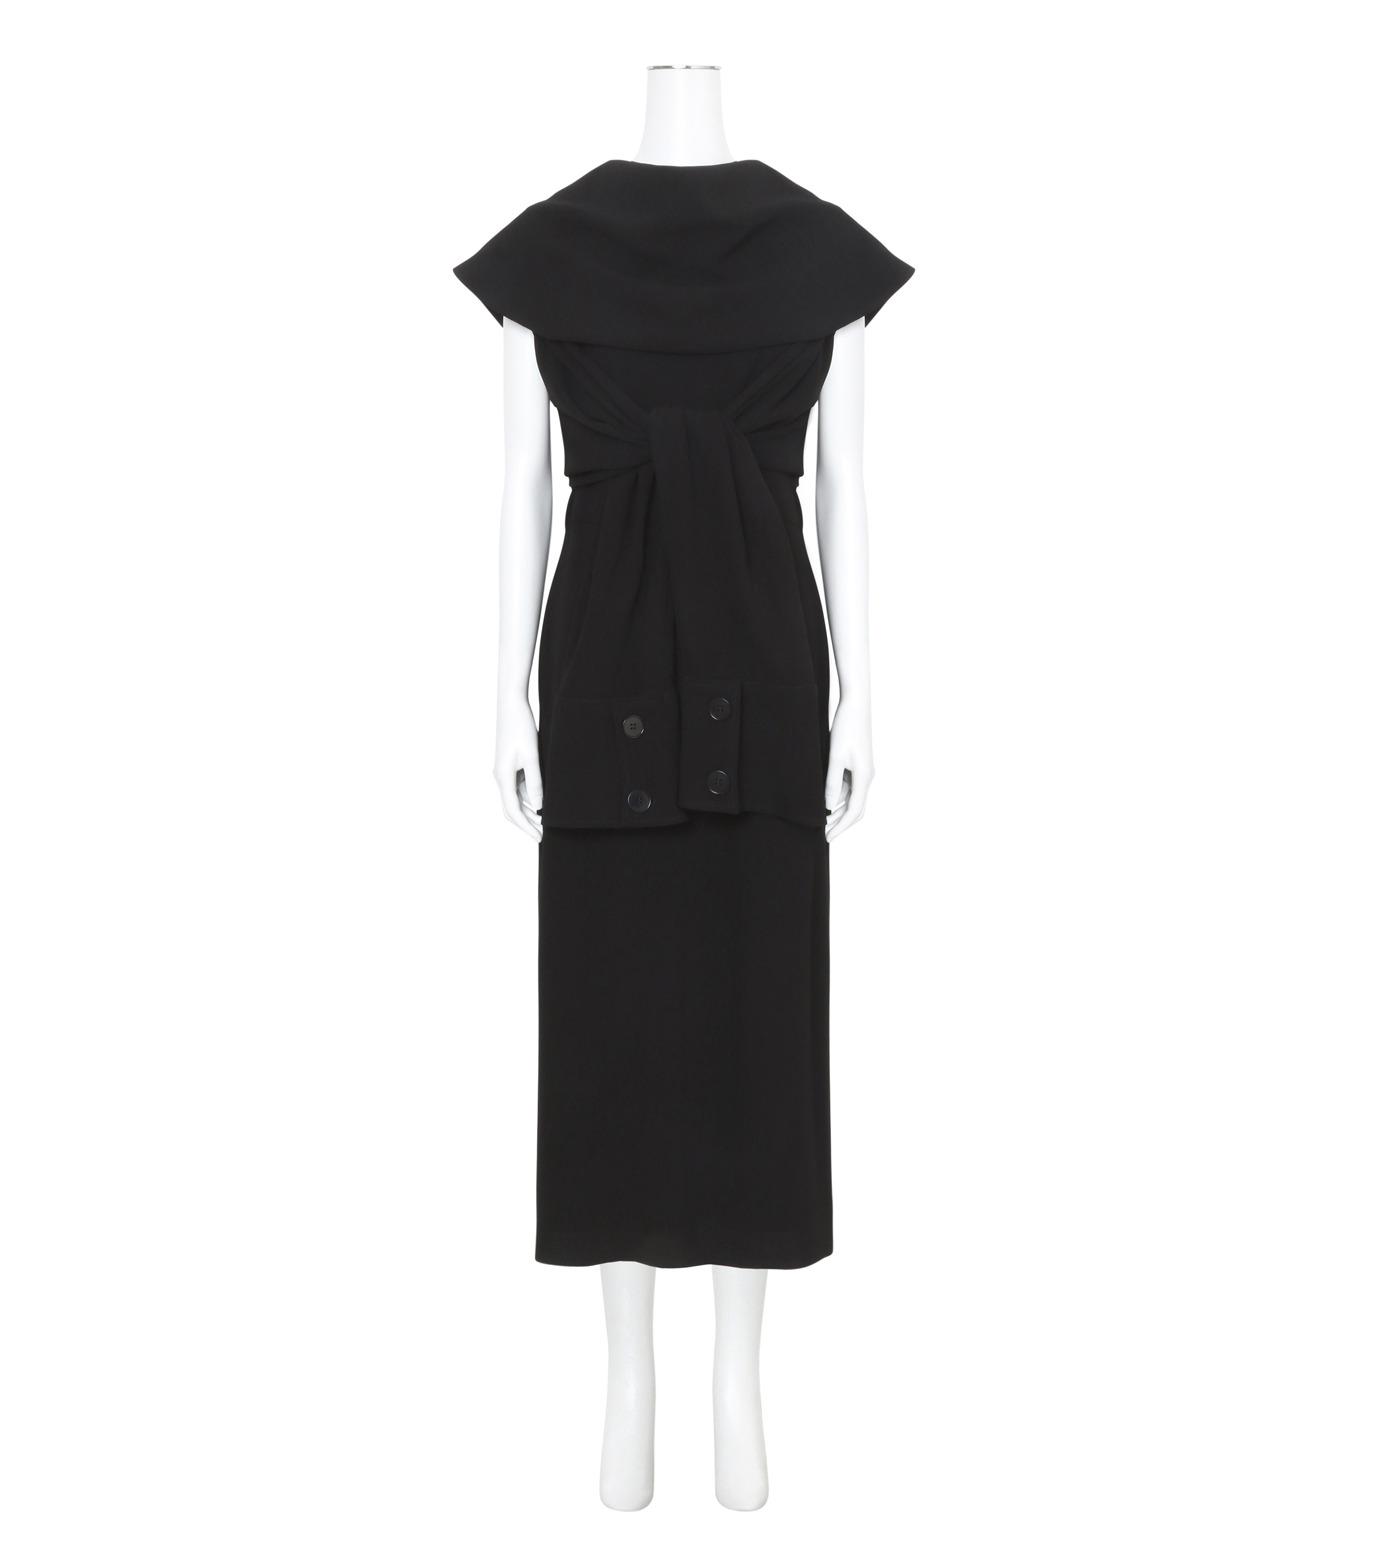 J.W.Anderson(ジェイダブリュー アンダーソン)のDeconstructed Dress-BLACK(ワンピース/one piece)-DR16-13 拡大詳細画像1